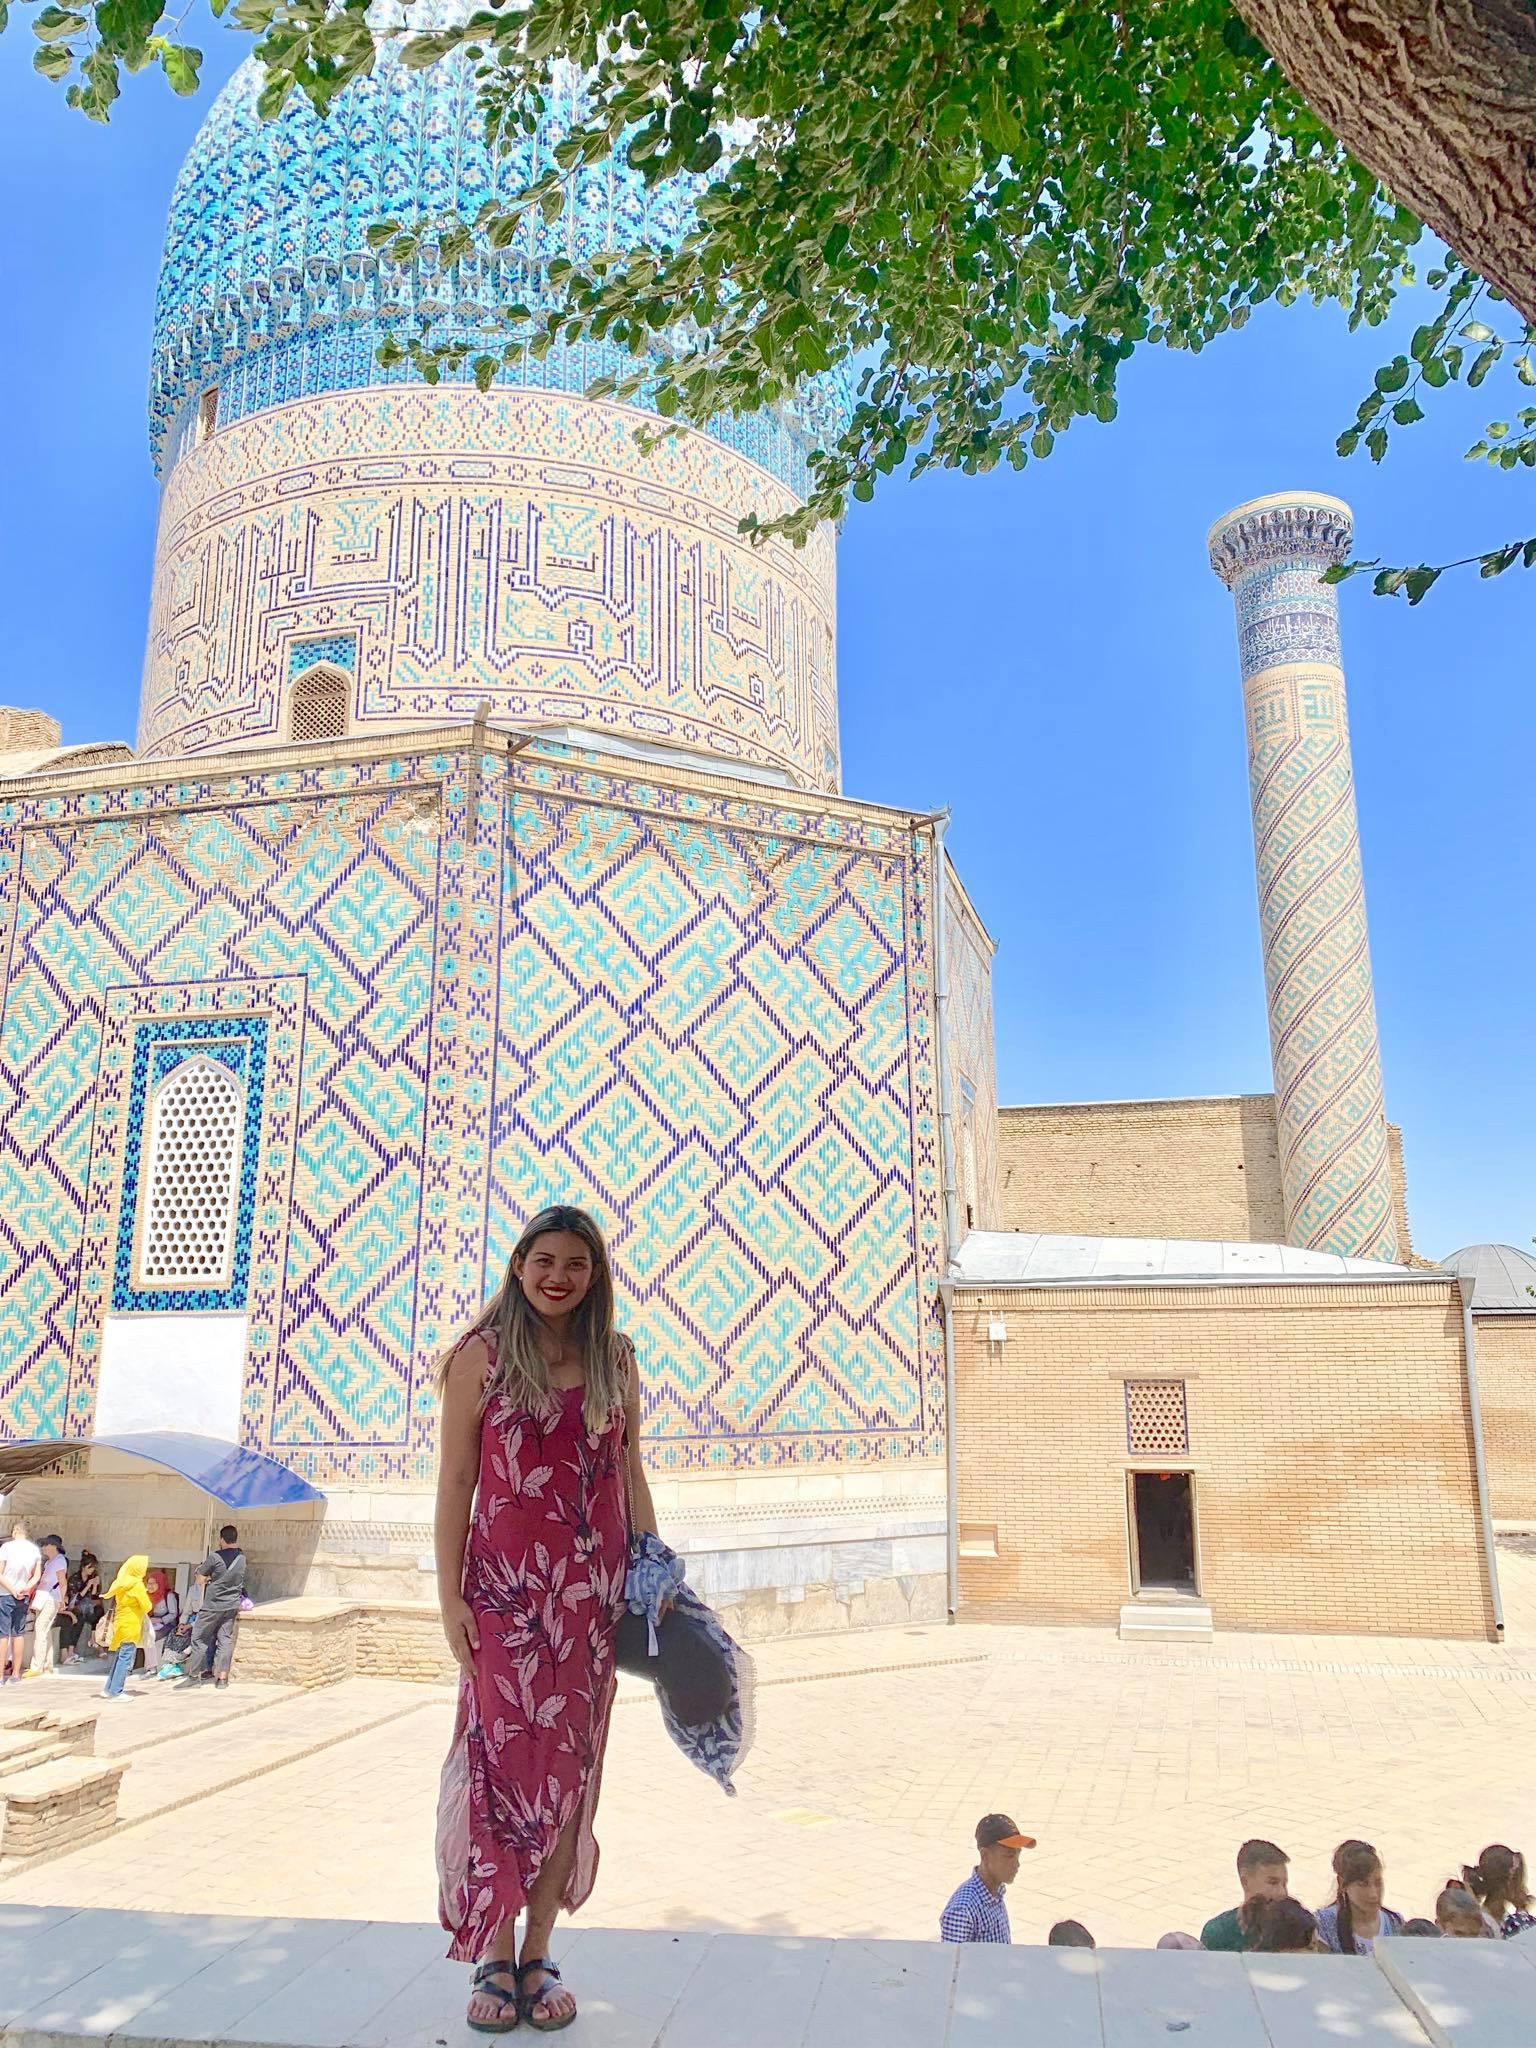 Kach Solo Travels in 2019 Siyab Bazaar and Registan on my first day in Samarkand11.jpg